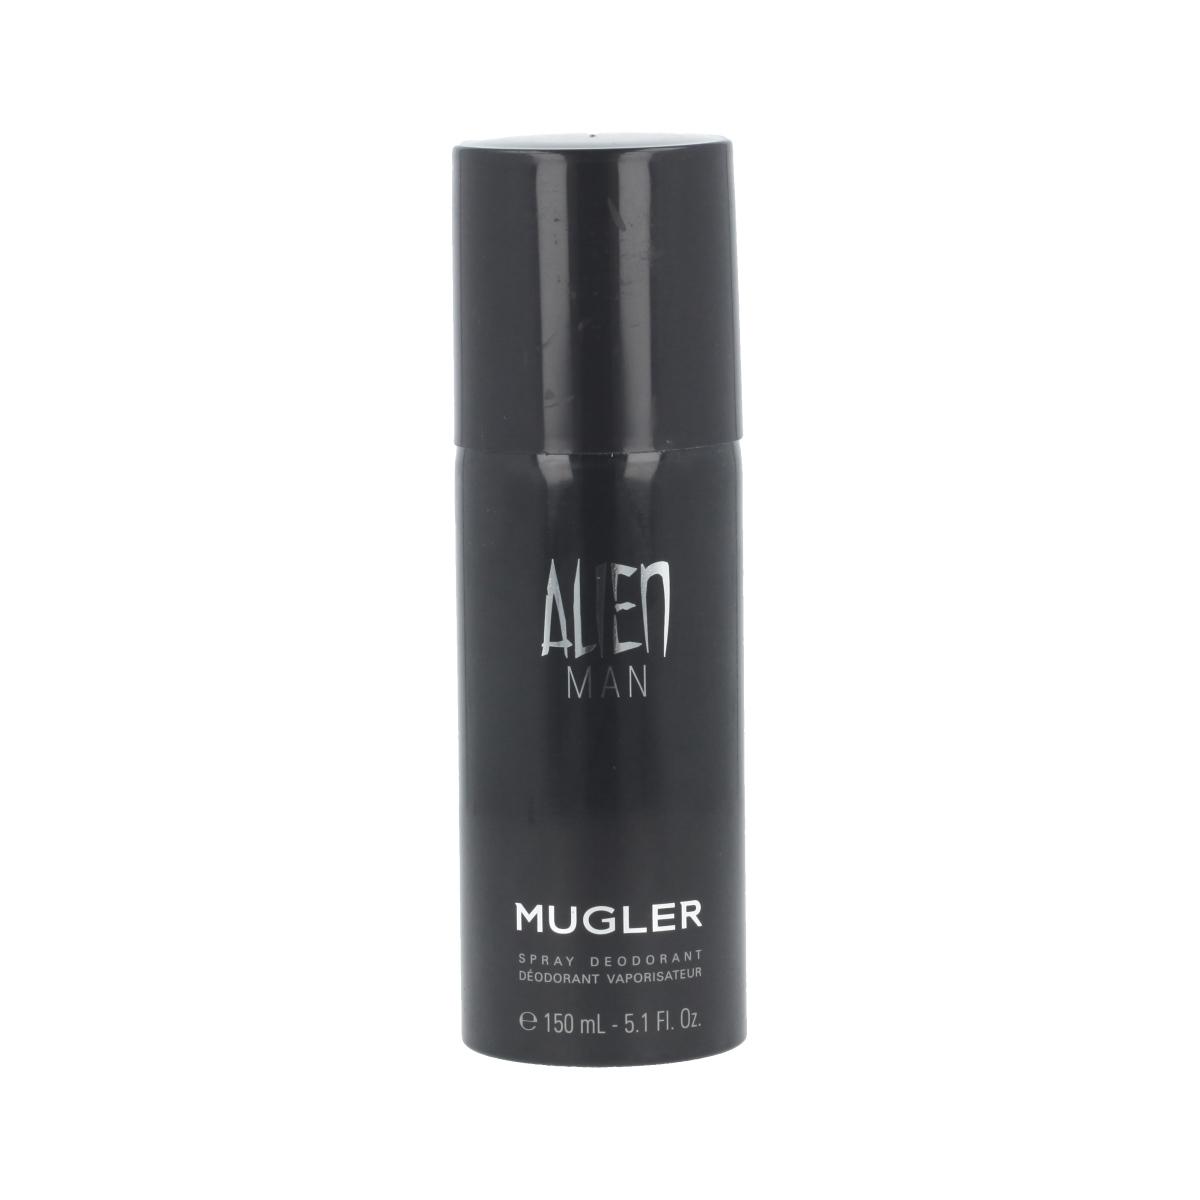 Mugler Alien Man Deodorant im Spray 150 ml (man) 14779